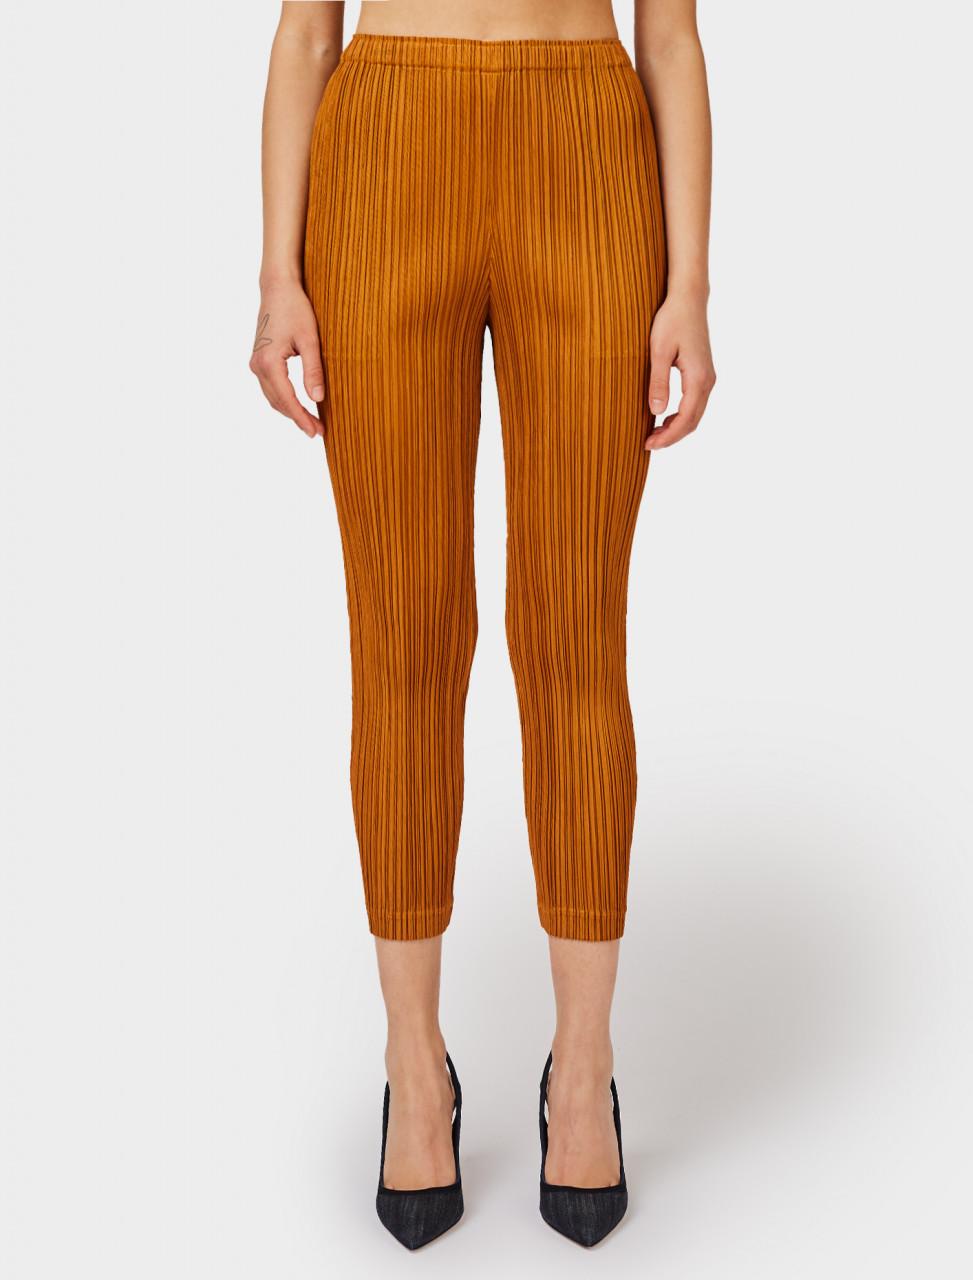 Front view of Pleats Please Issey Miyake Slim Leg Pleated Trousers in Orange Brown